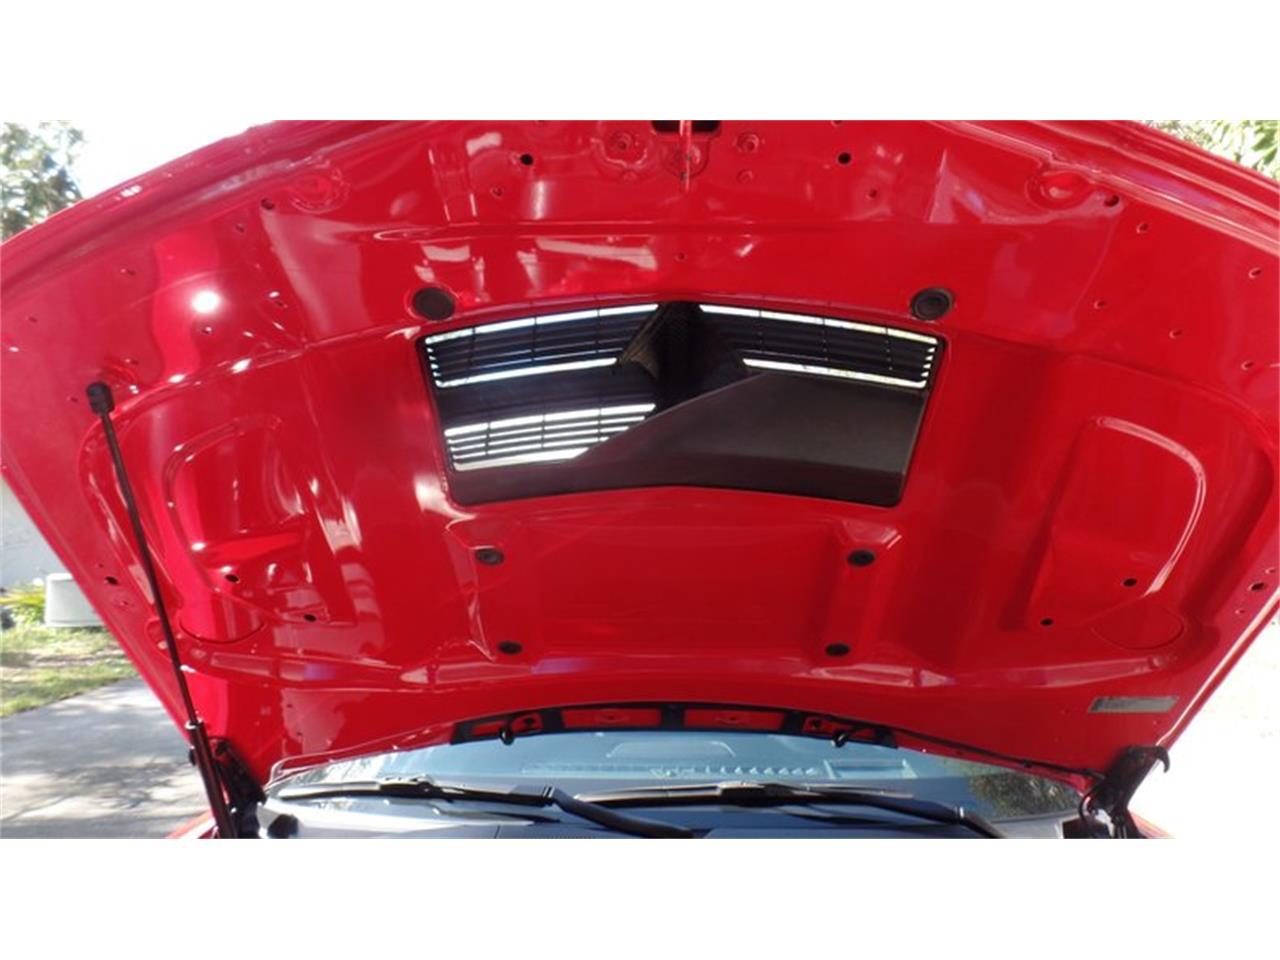 2013 Chevrolet Camaro (CC-1319292) for sale in Punta Gorda, Florida